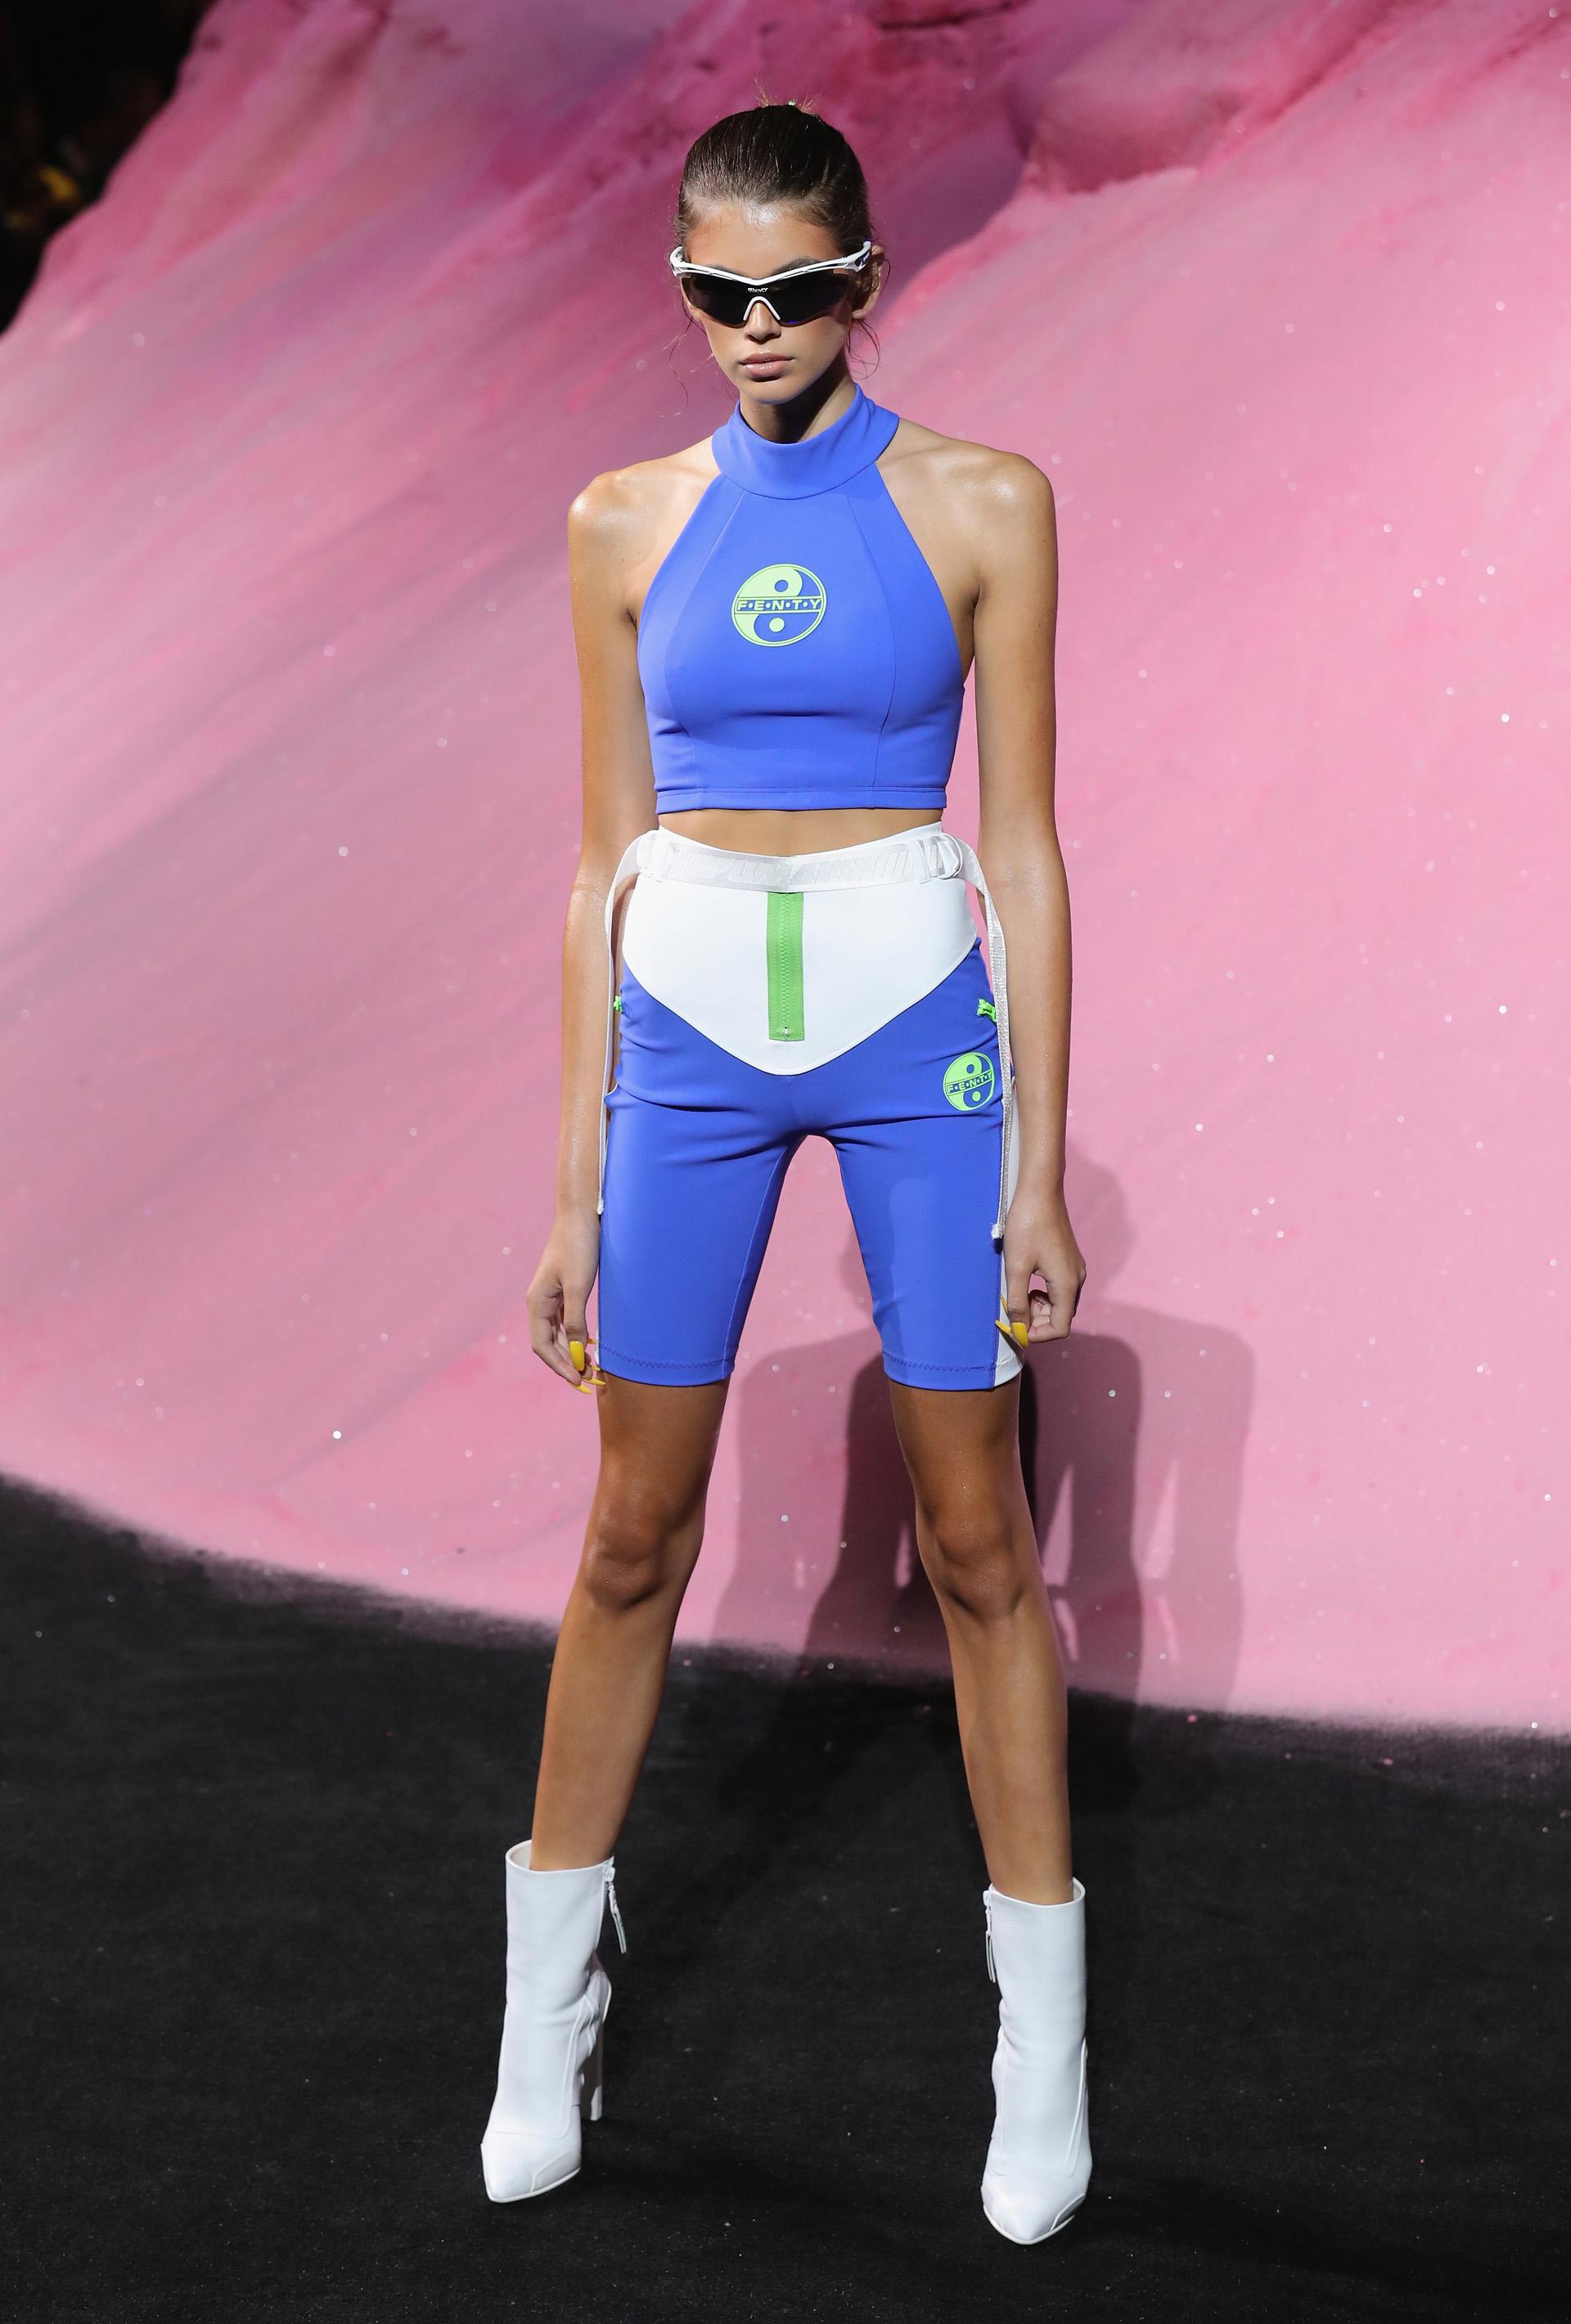 Kaia Gerber, la modelo centennial, fue otra vez elegida para participar del New York Fashion Week (JP Yim/Getty Images for FENTY PUMA By Rihanna)